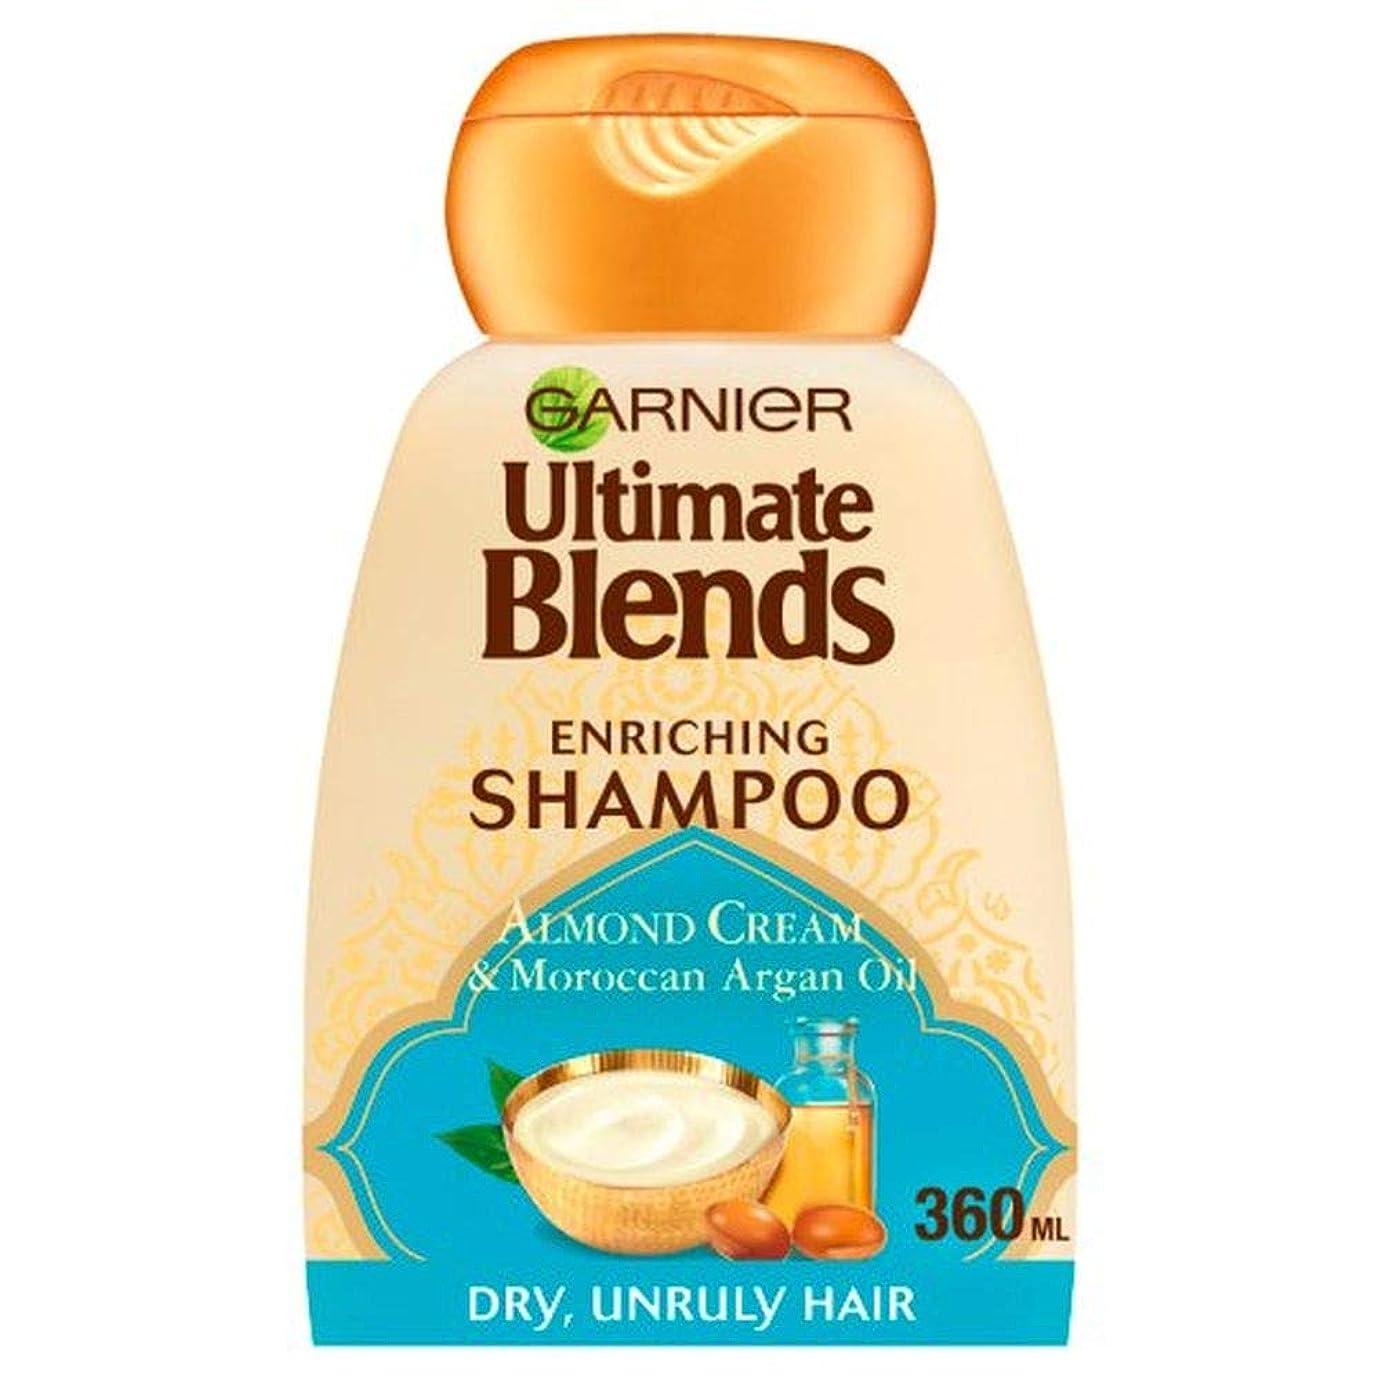 [Garnier ] Ga/究極のブレンドのArg /オイルとアーモンドシャンプー360ミリリットルRを - Ga/R Ultimate Blends Arg/Oil And Almond Shampoo 360Ml [並行輸入品]